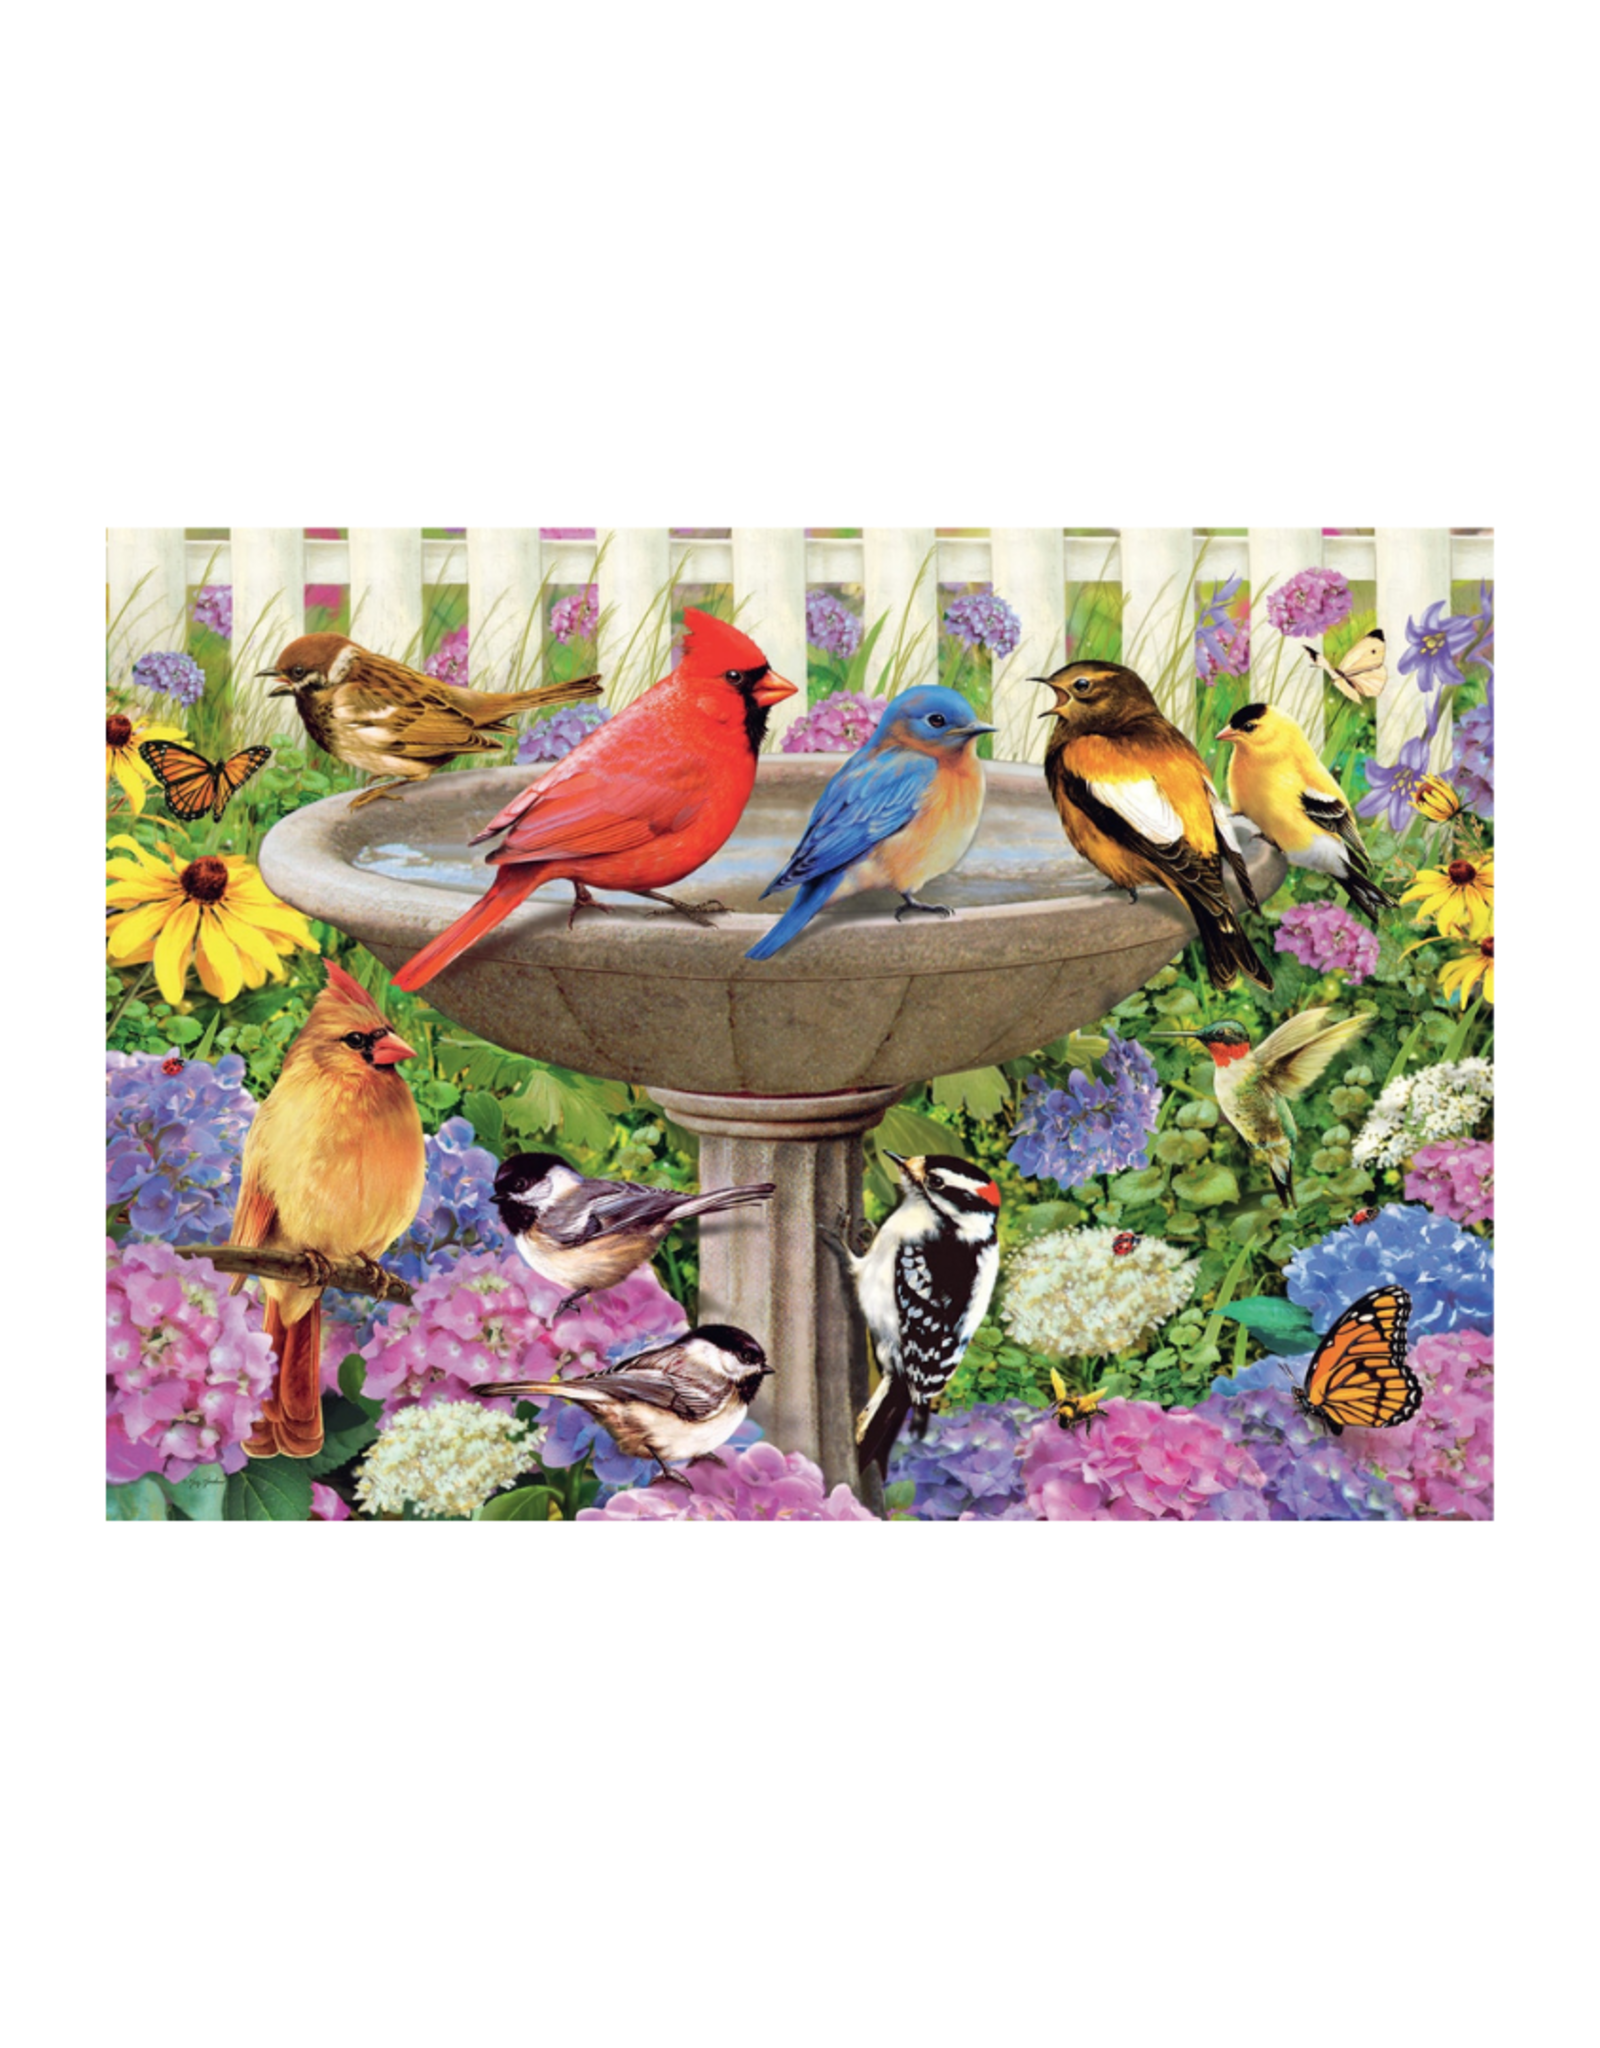 Ravensburger At the Birdbath 500pc Puzzle Large Format